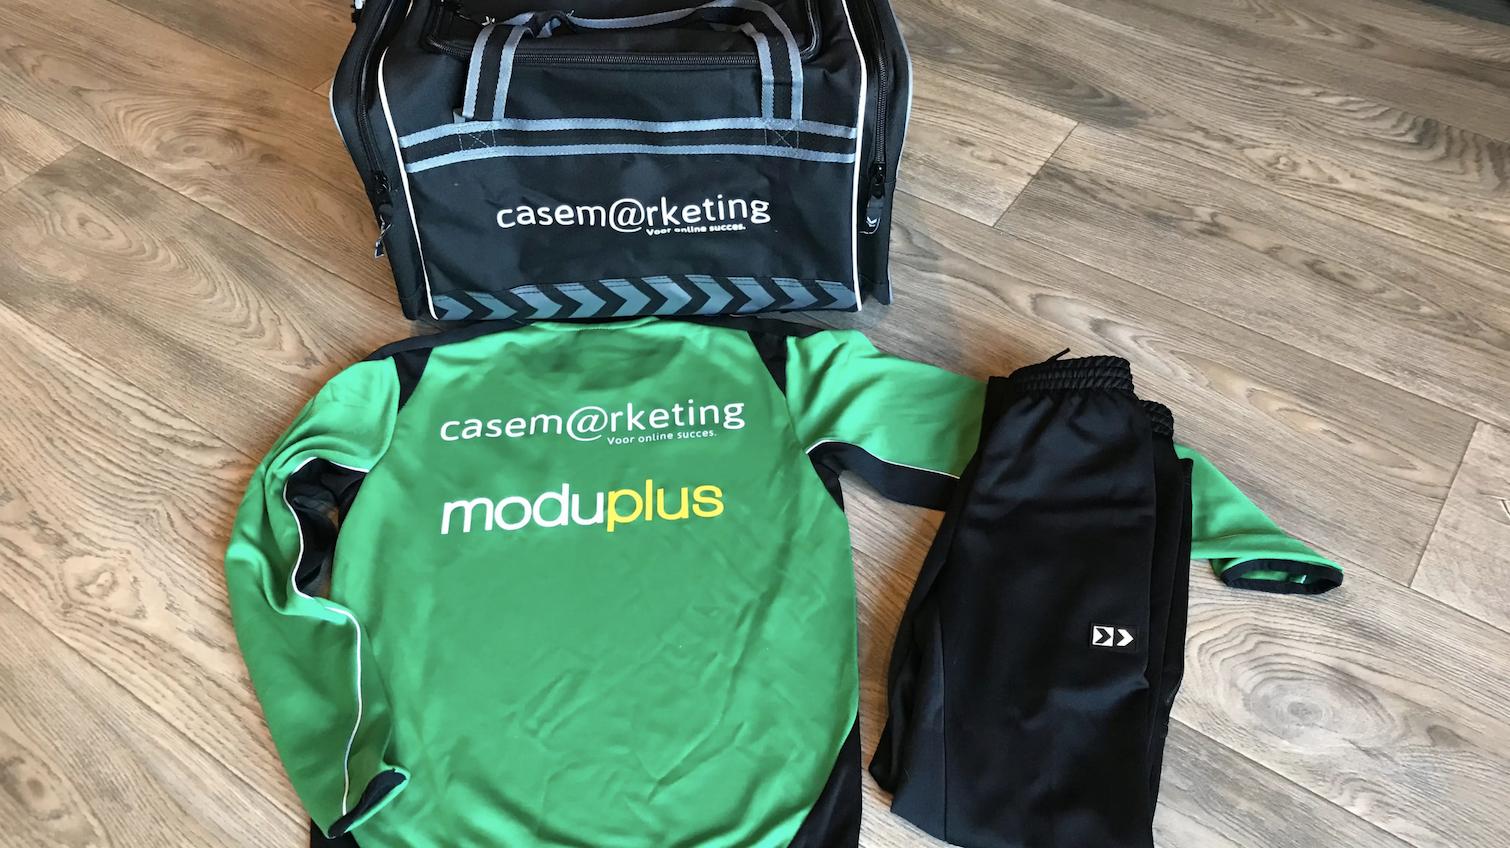 CaseMarketing sponsor van SCP jeugd